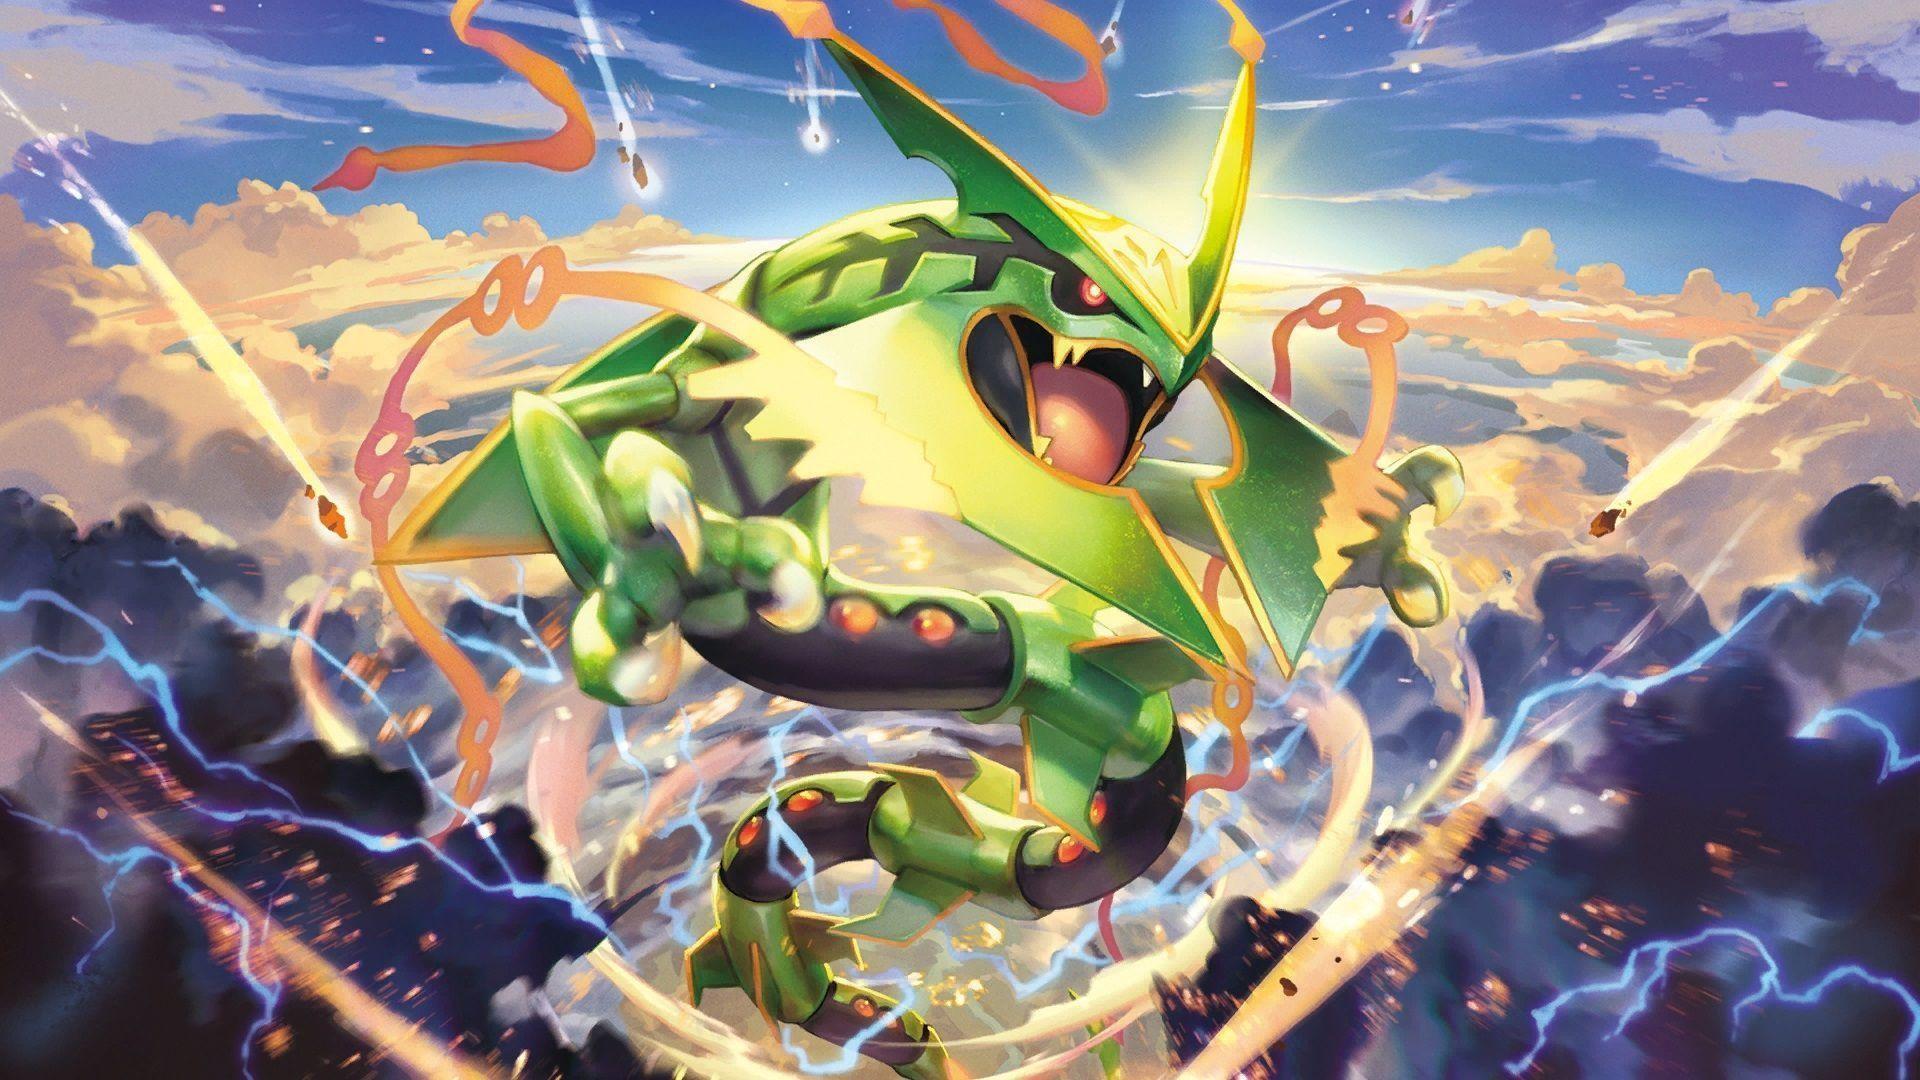 1920x1080 Pokemon Mega Rayquaza Wallpaper Wallpapers